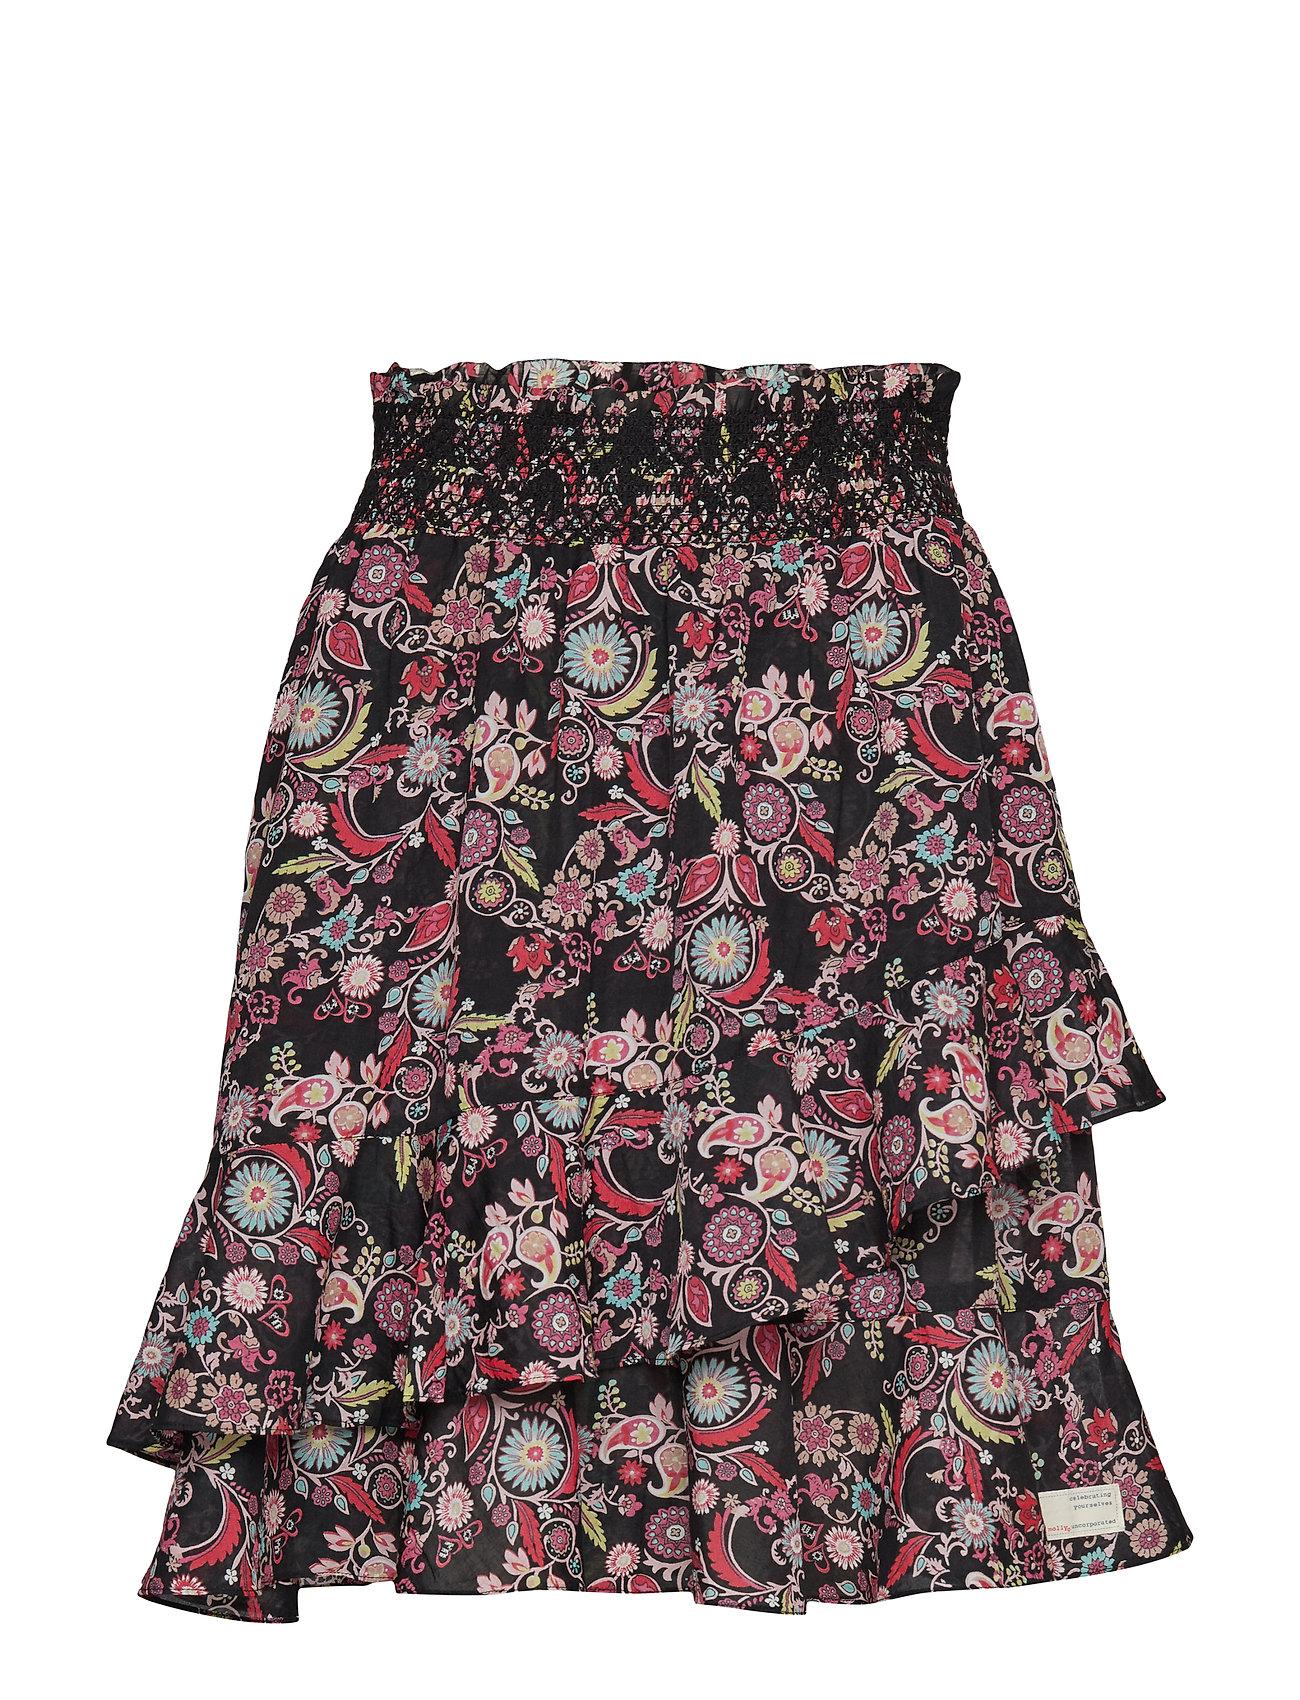 ODD MOLLY majestic skirt - BLACK MULTI